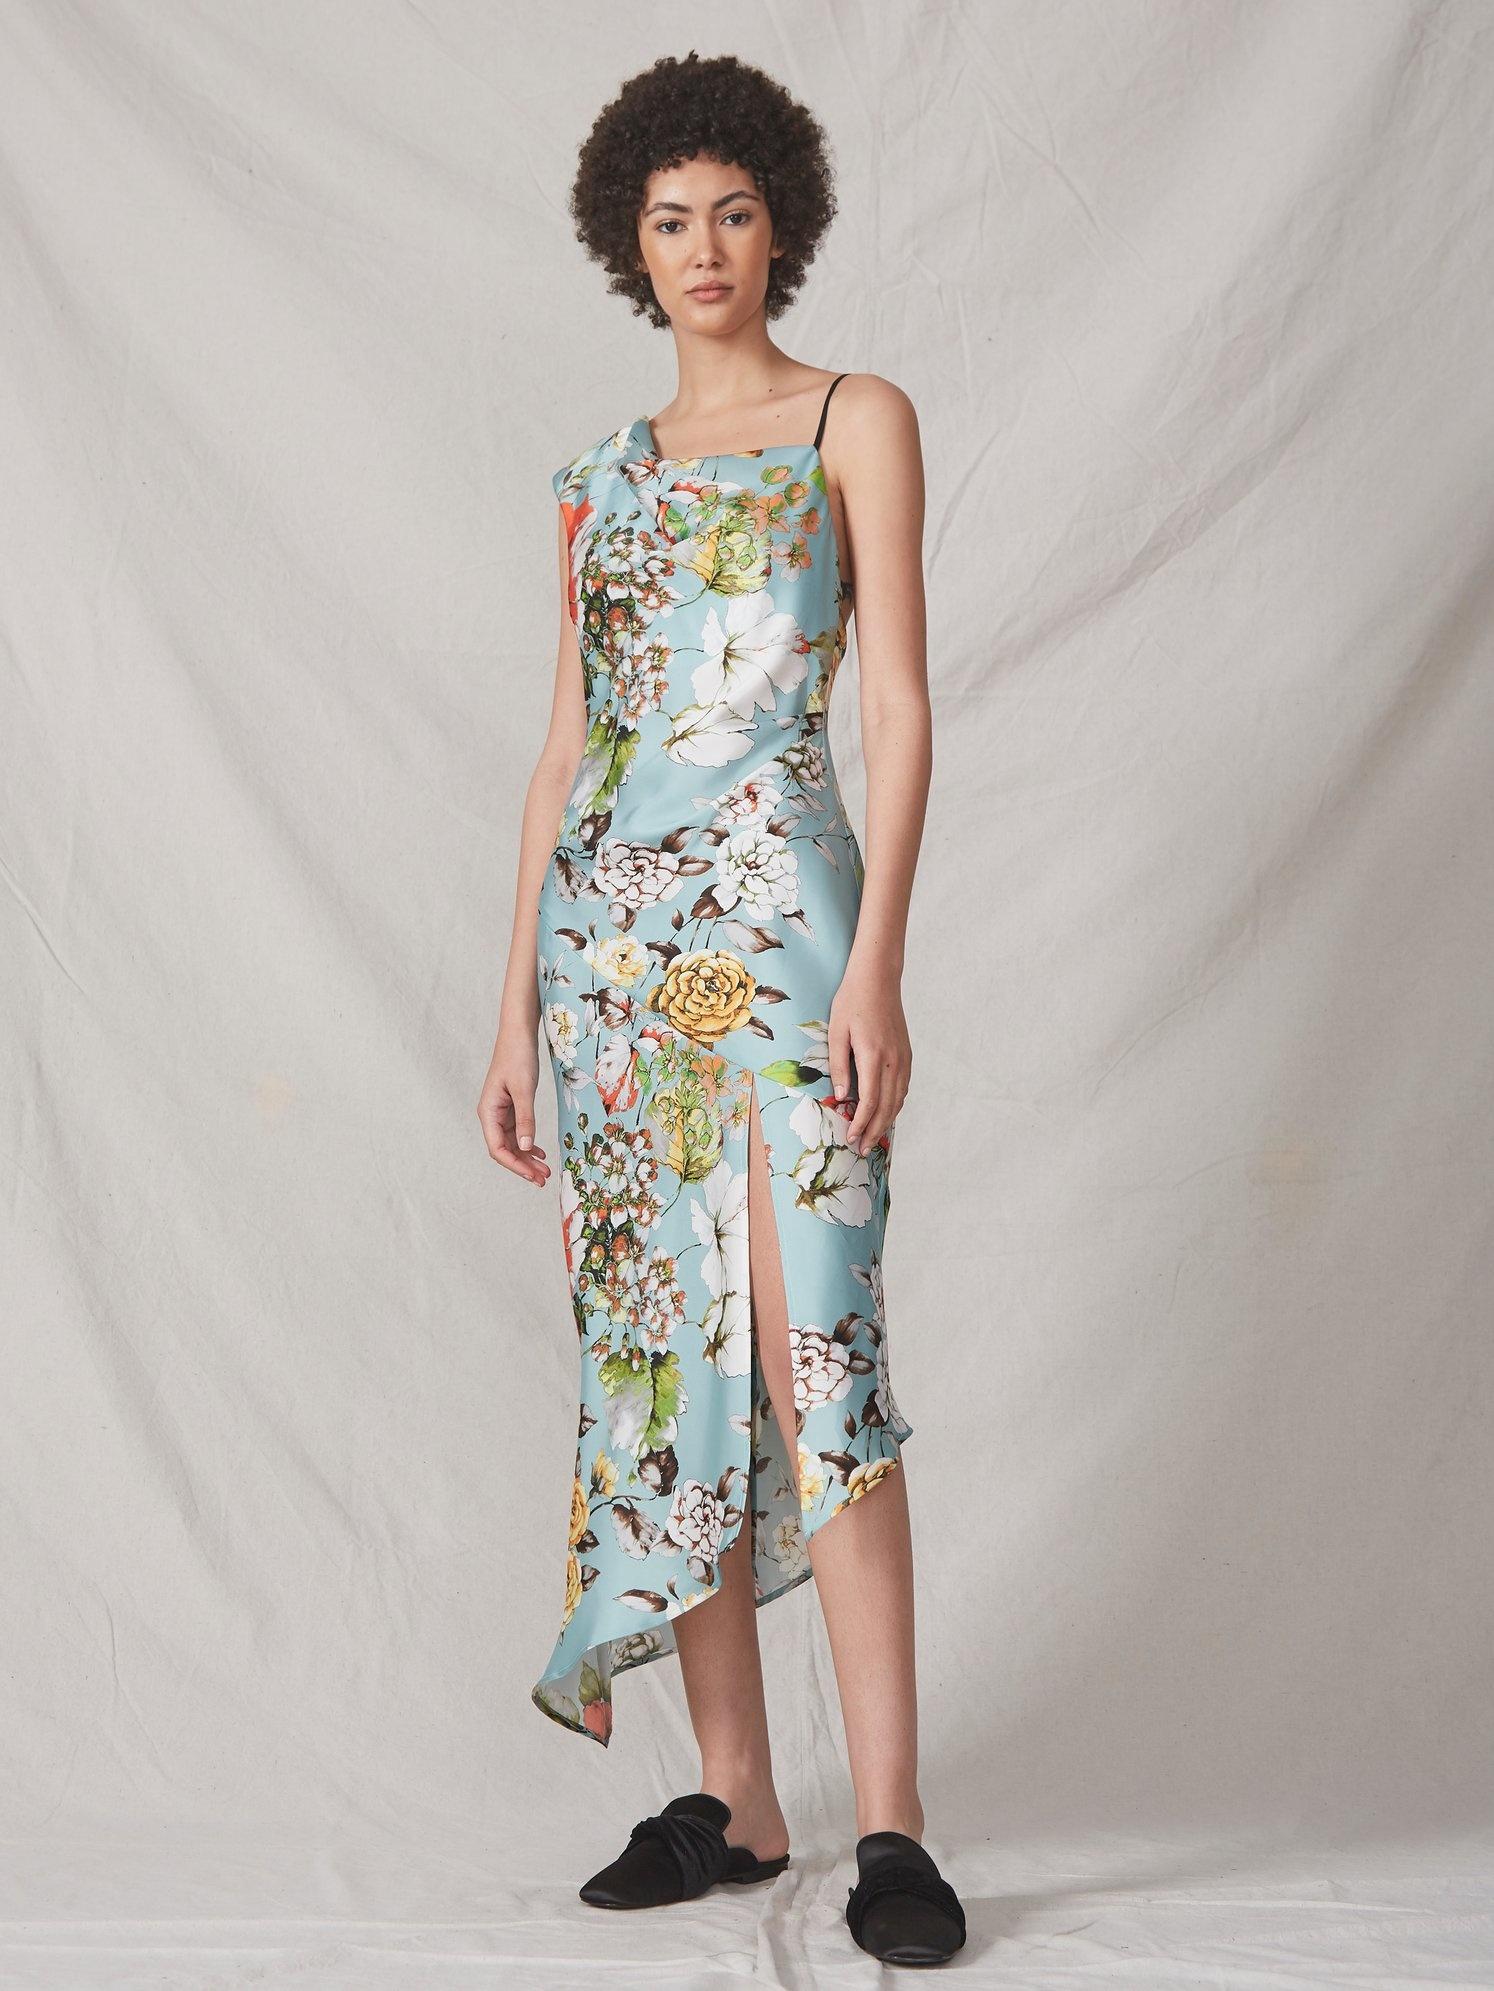 ALLEN SHWARTZ Everly Asymmetric Dress